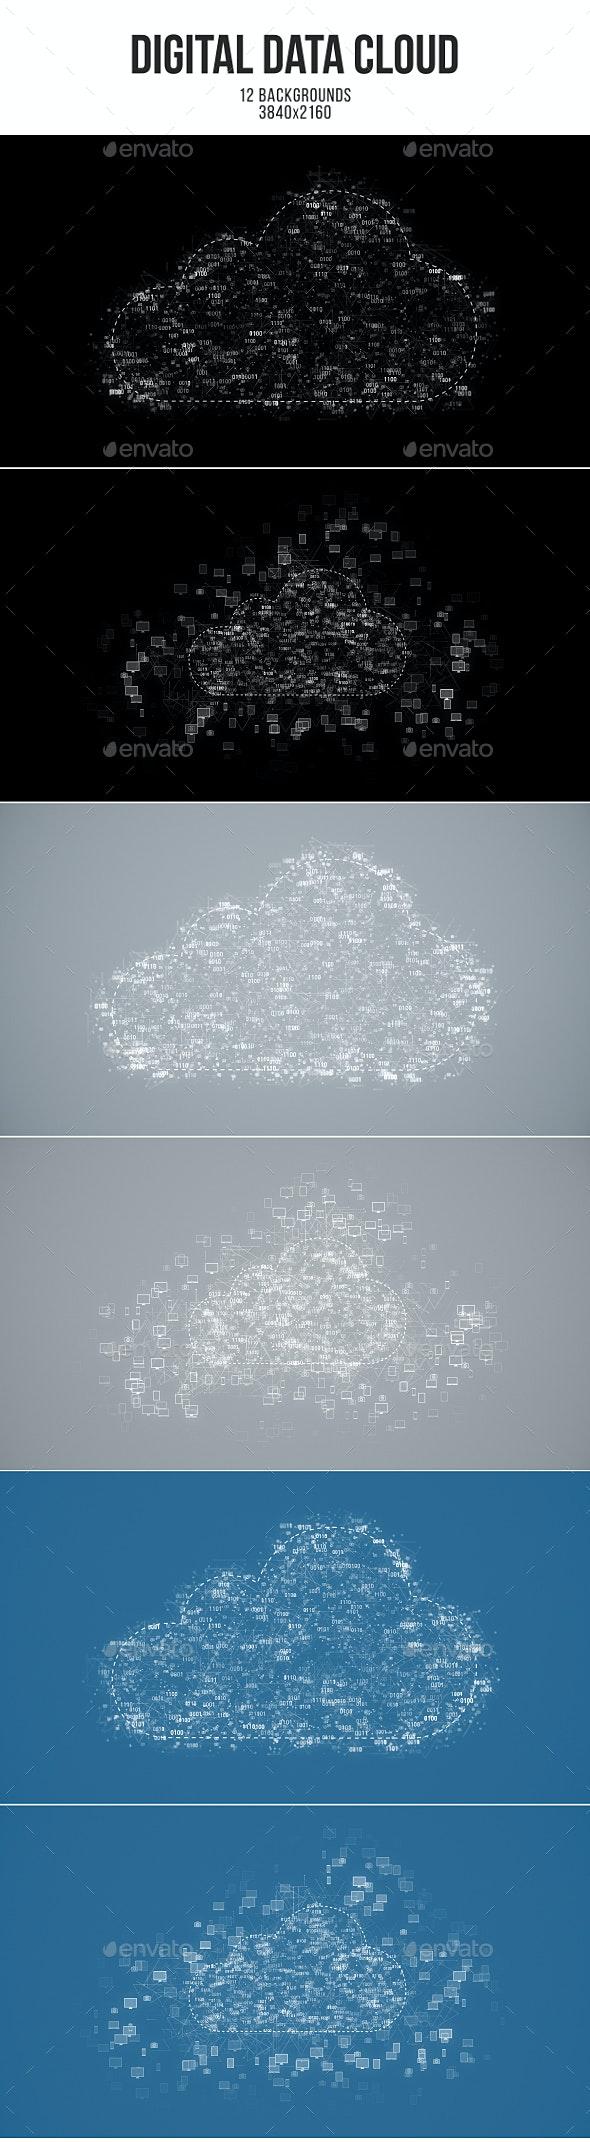 Digital Data Cloud - Tech / Futuristic Backgrounds